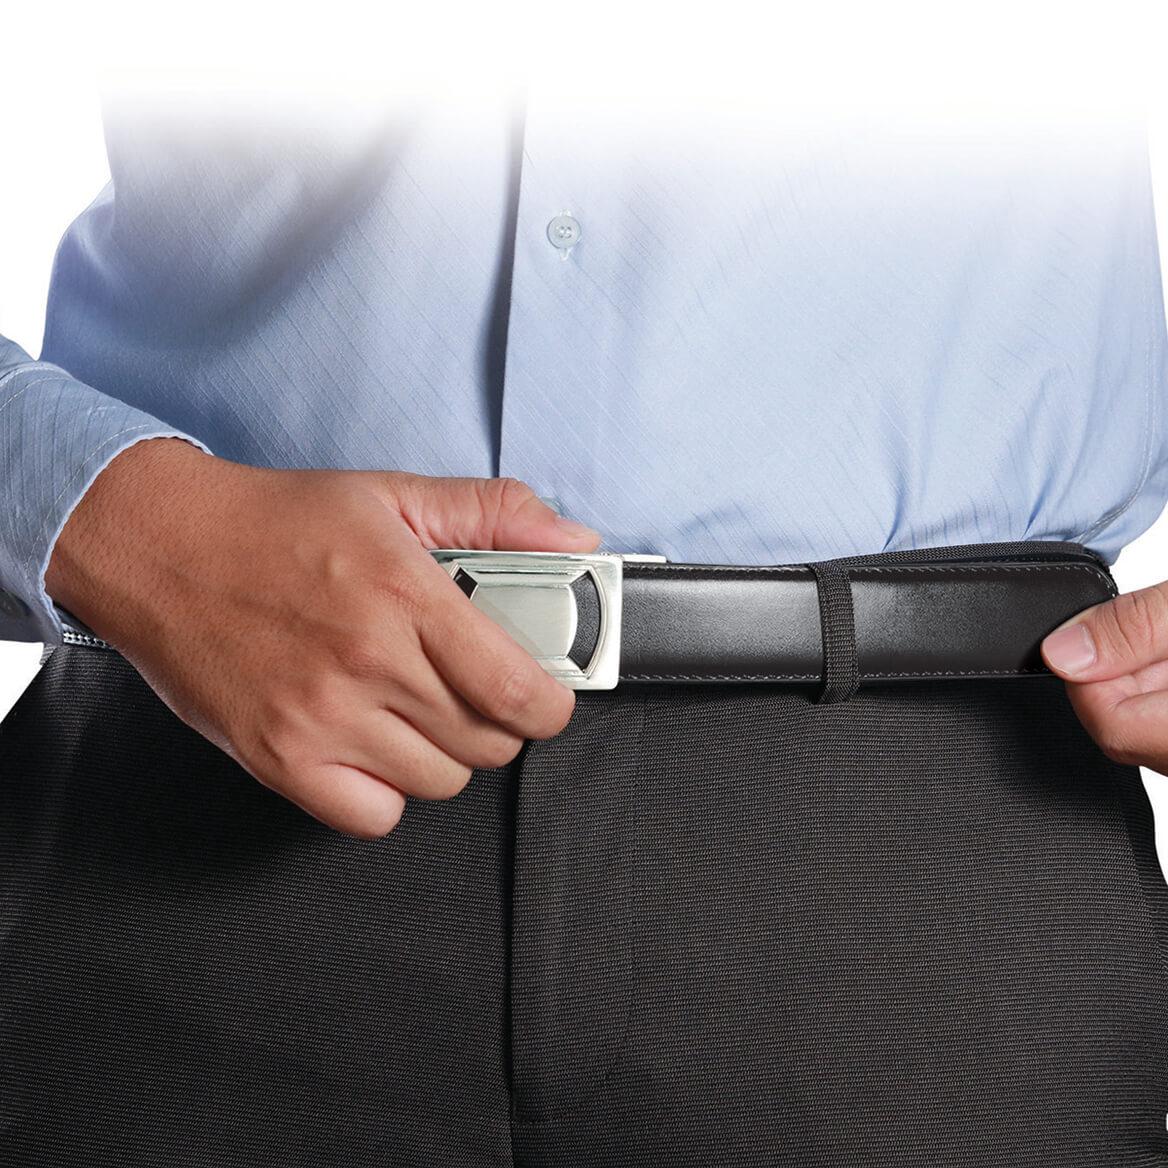 Custom Fit Belts S/2 (One Black, One Brown)-370306